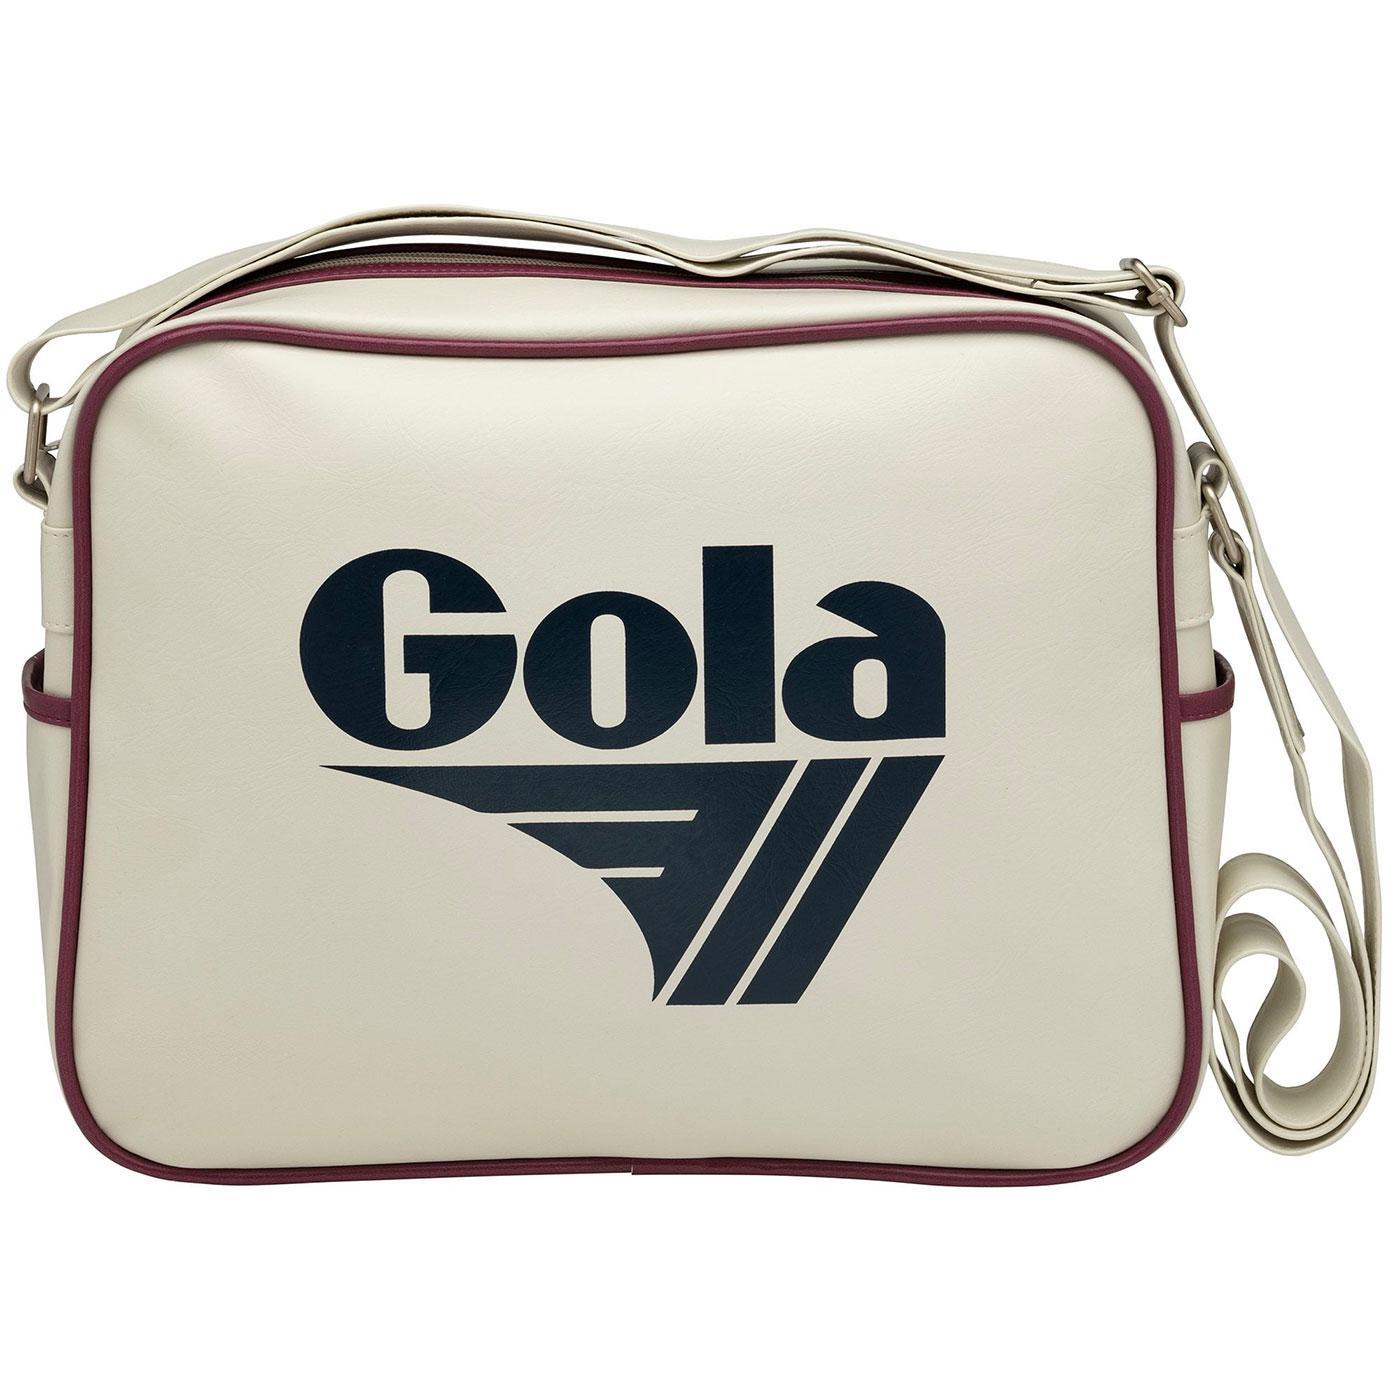 Redford GOLA Retro 70s Sports Shoulder Bag (E/N/B)